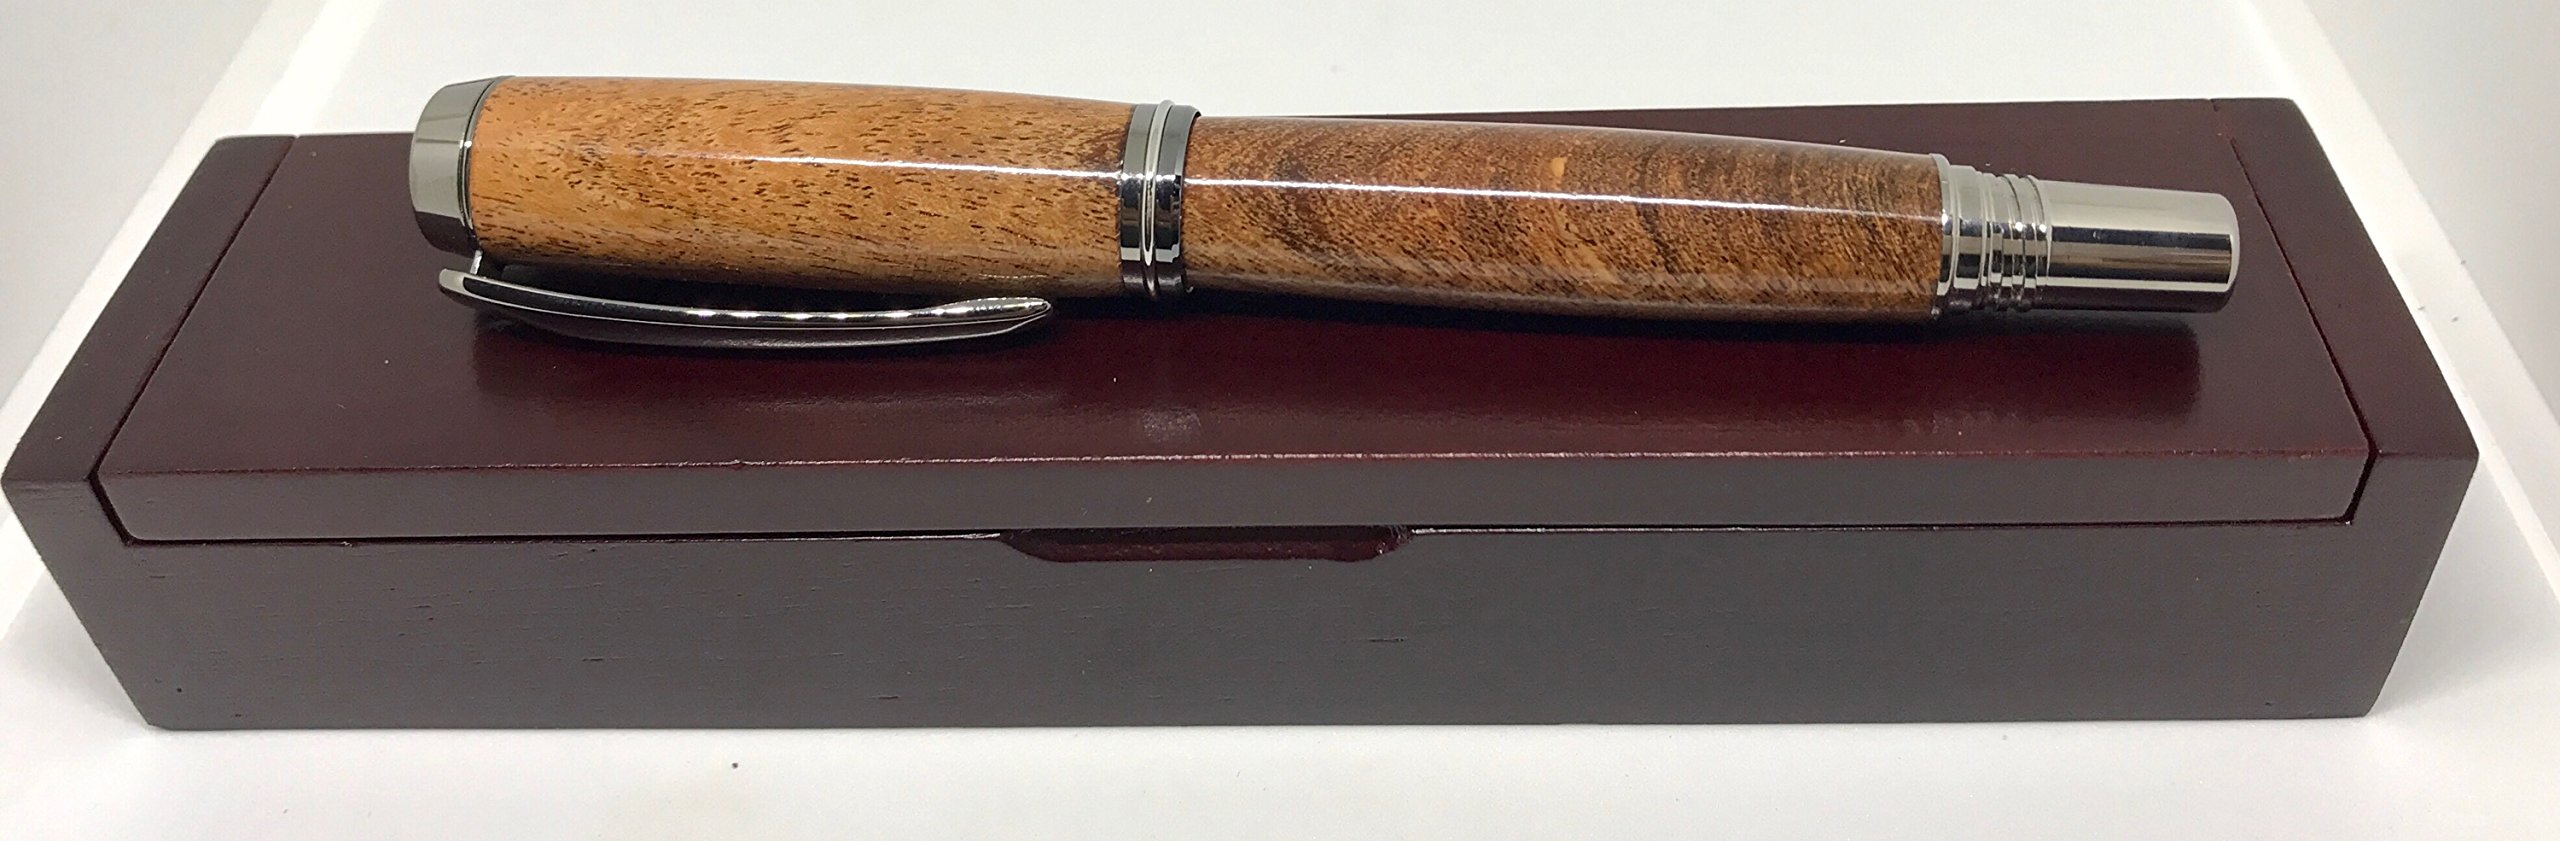 Texas Mesquite Handmade Rollerball Pen - Bendecidos Pens - Black Titanium Plating